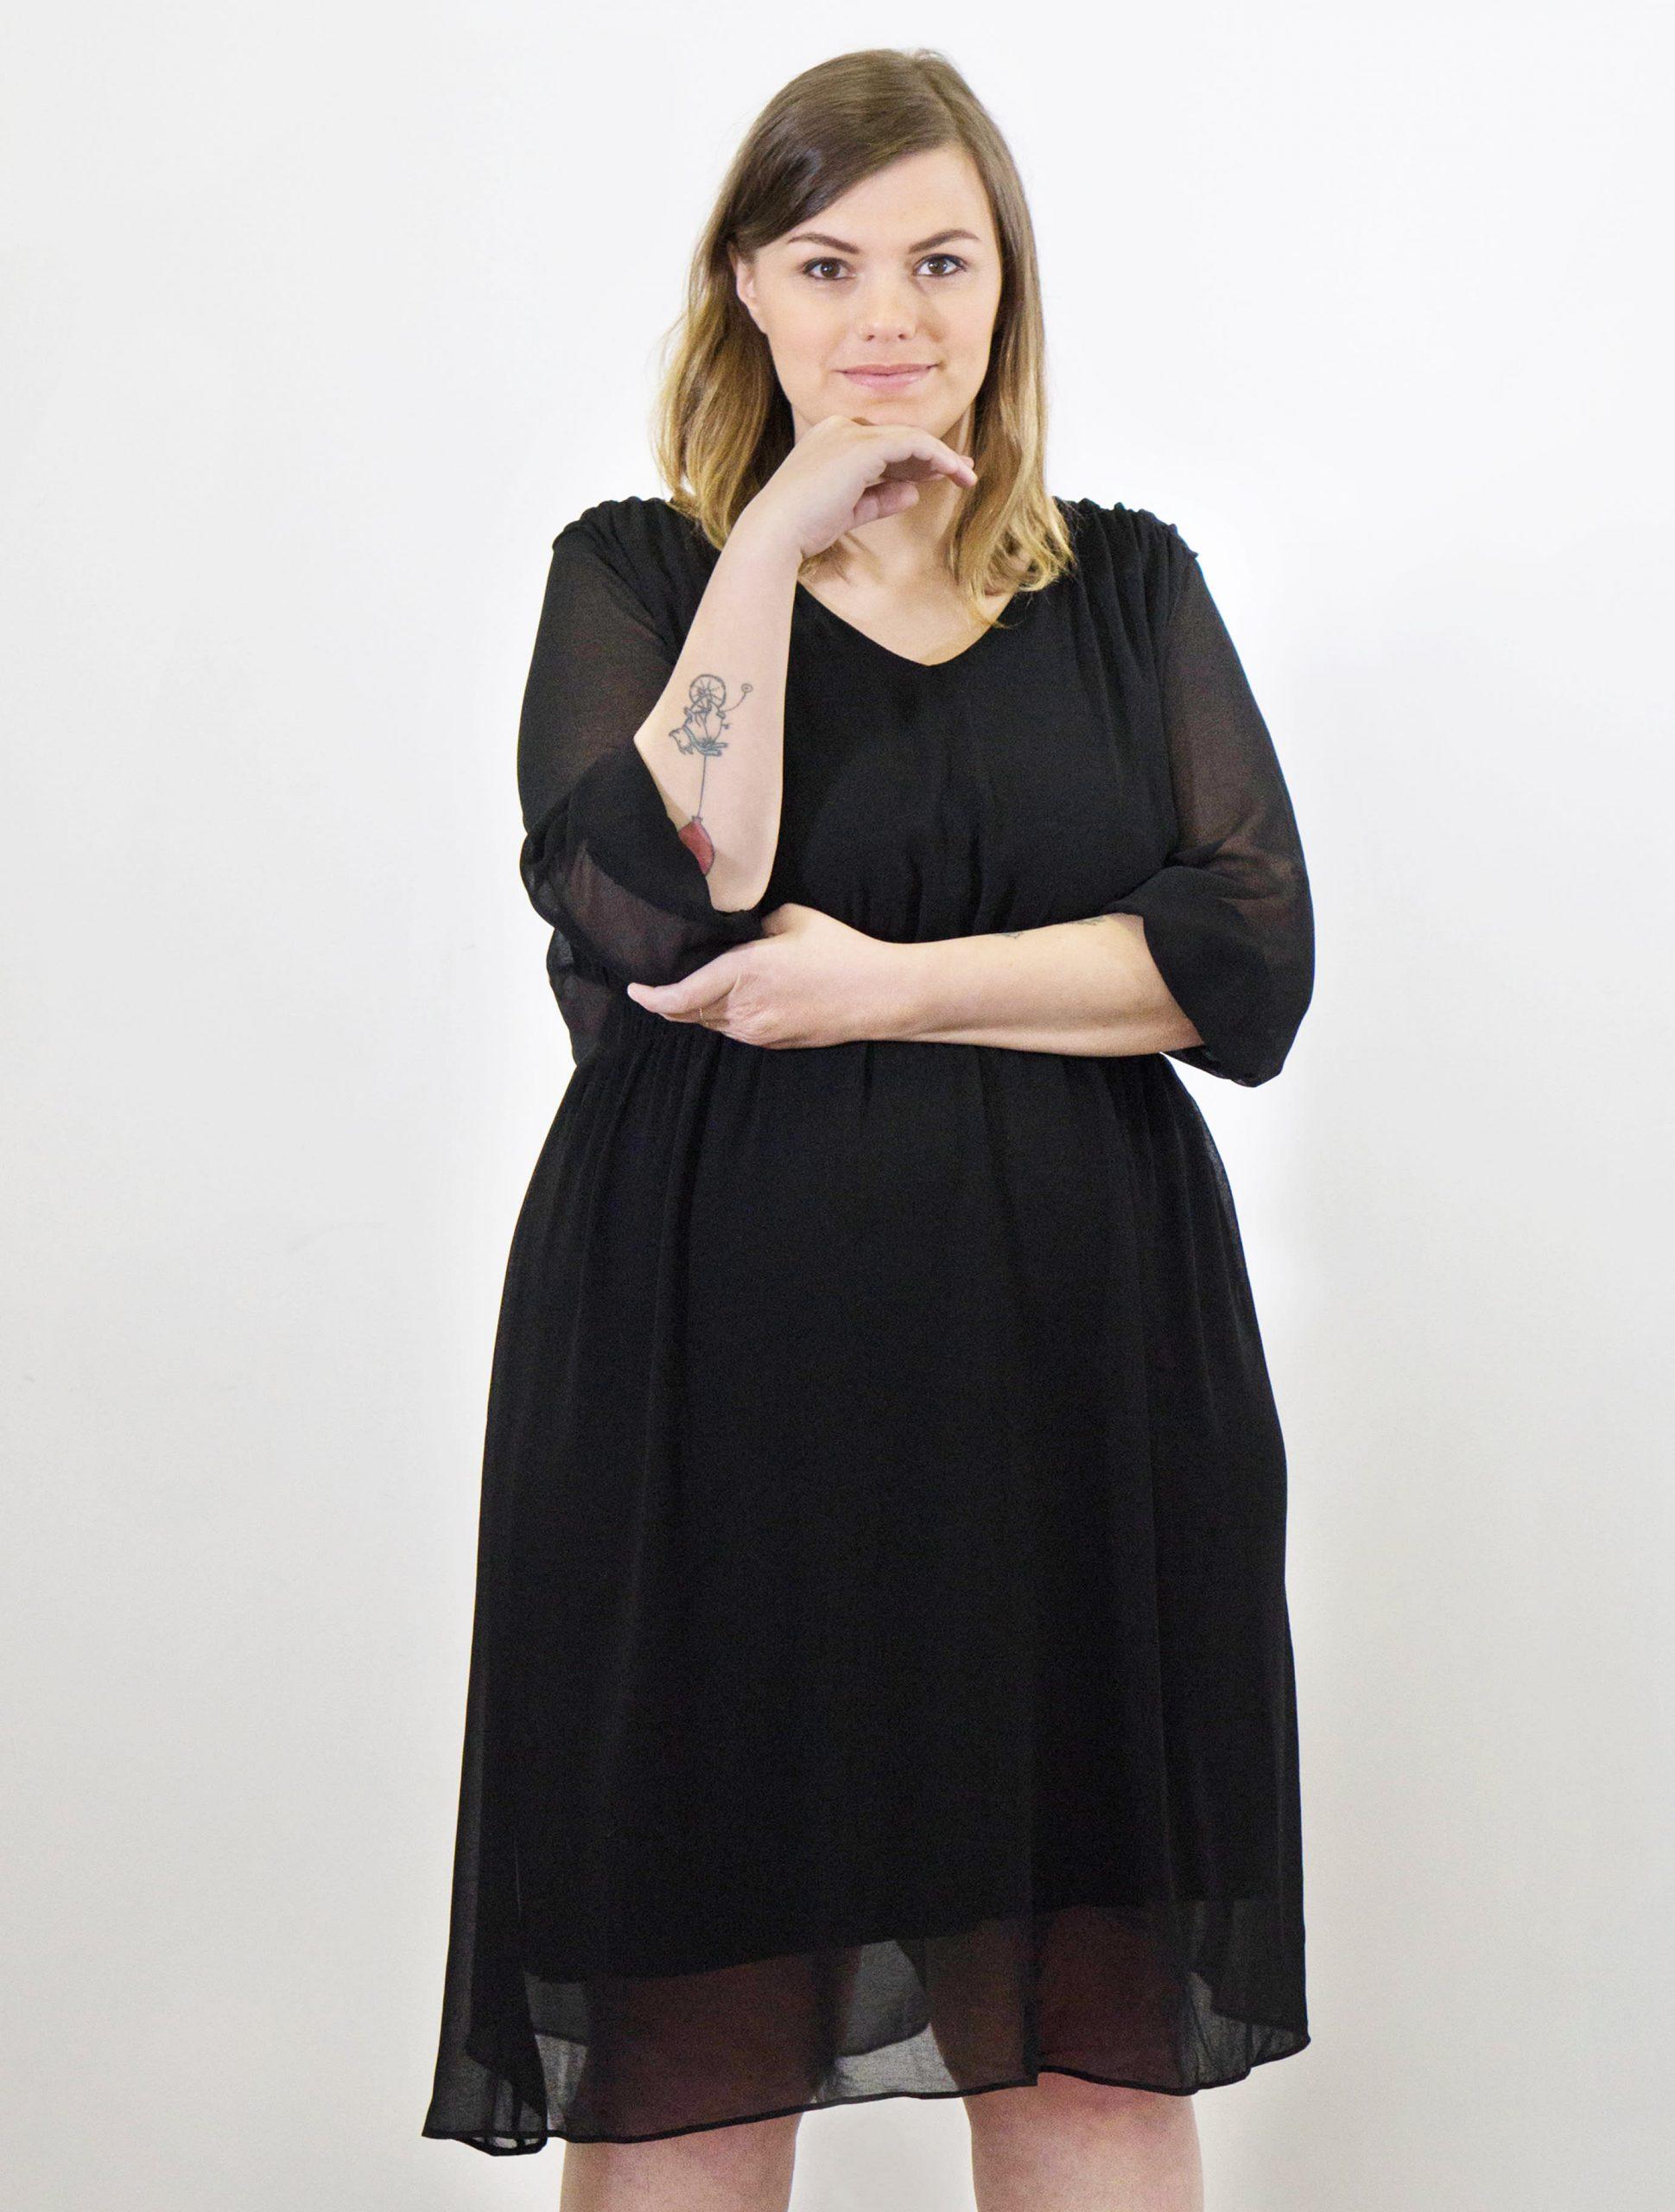 Schön Kleid Lang Gr 50 GalerieAbend Genial Kleid Lang Gr 50 Design